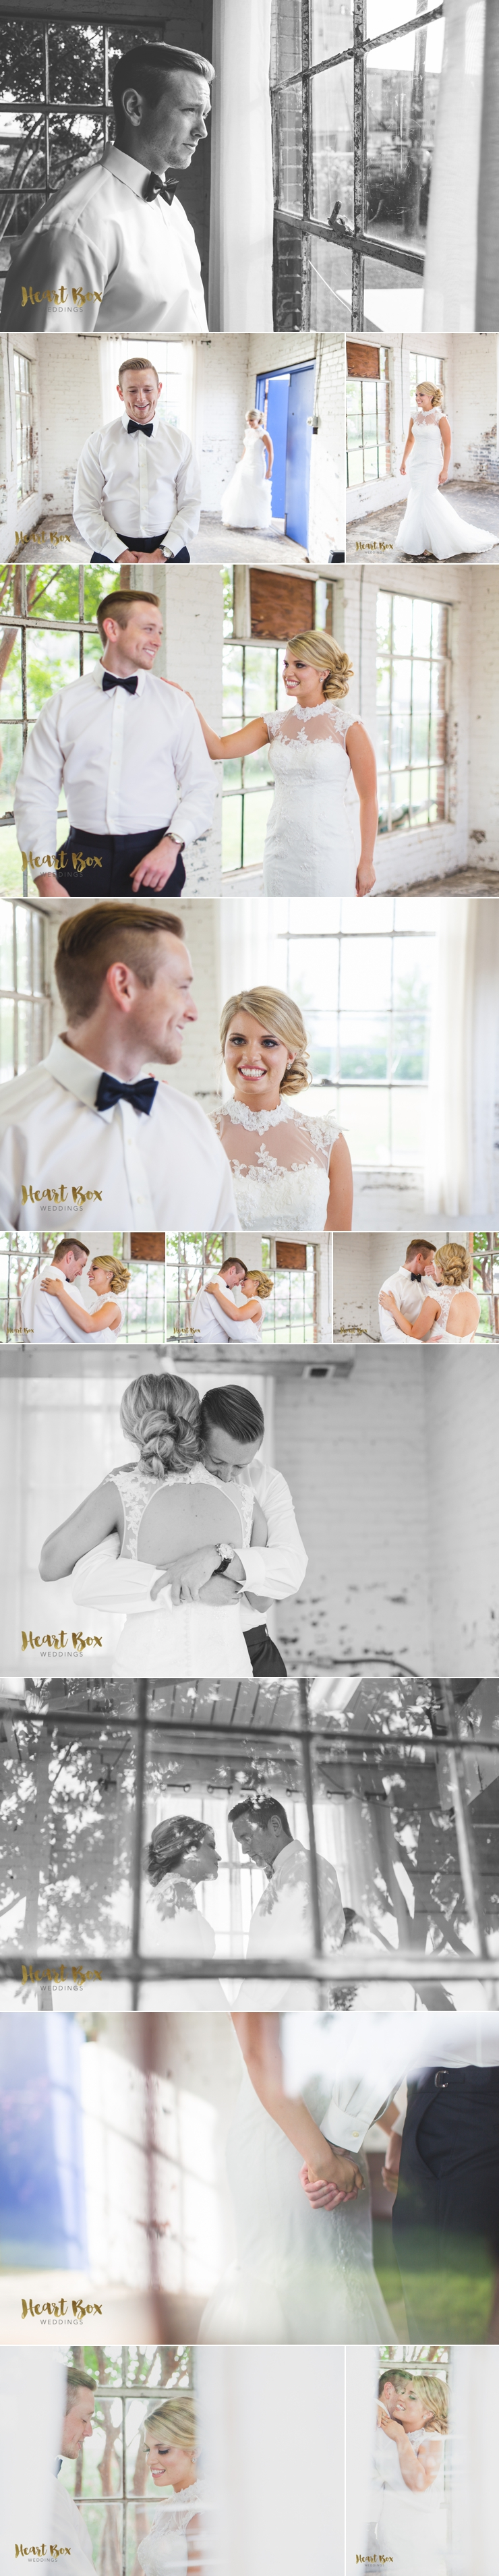 Mabry Wedding 8.jpg